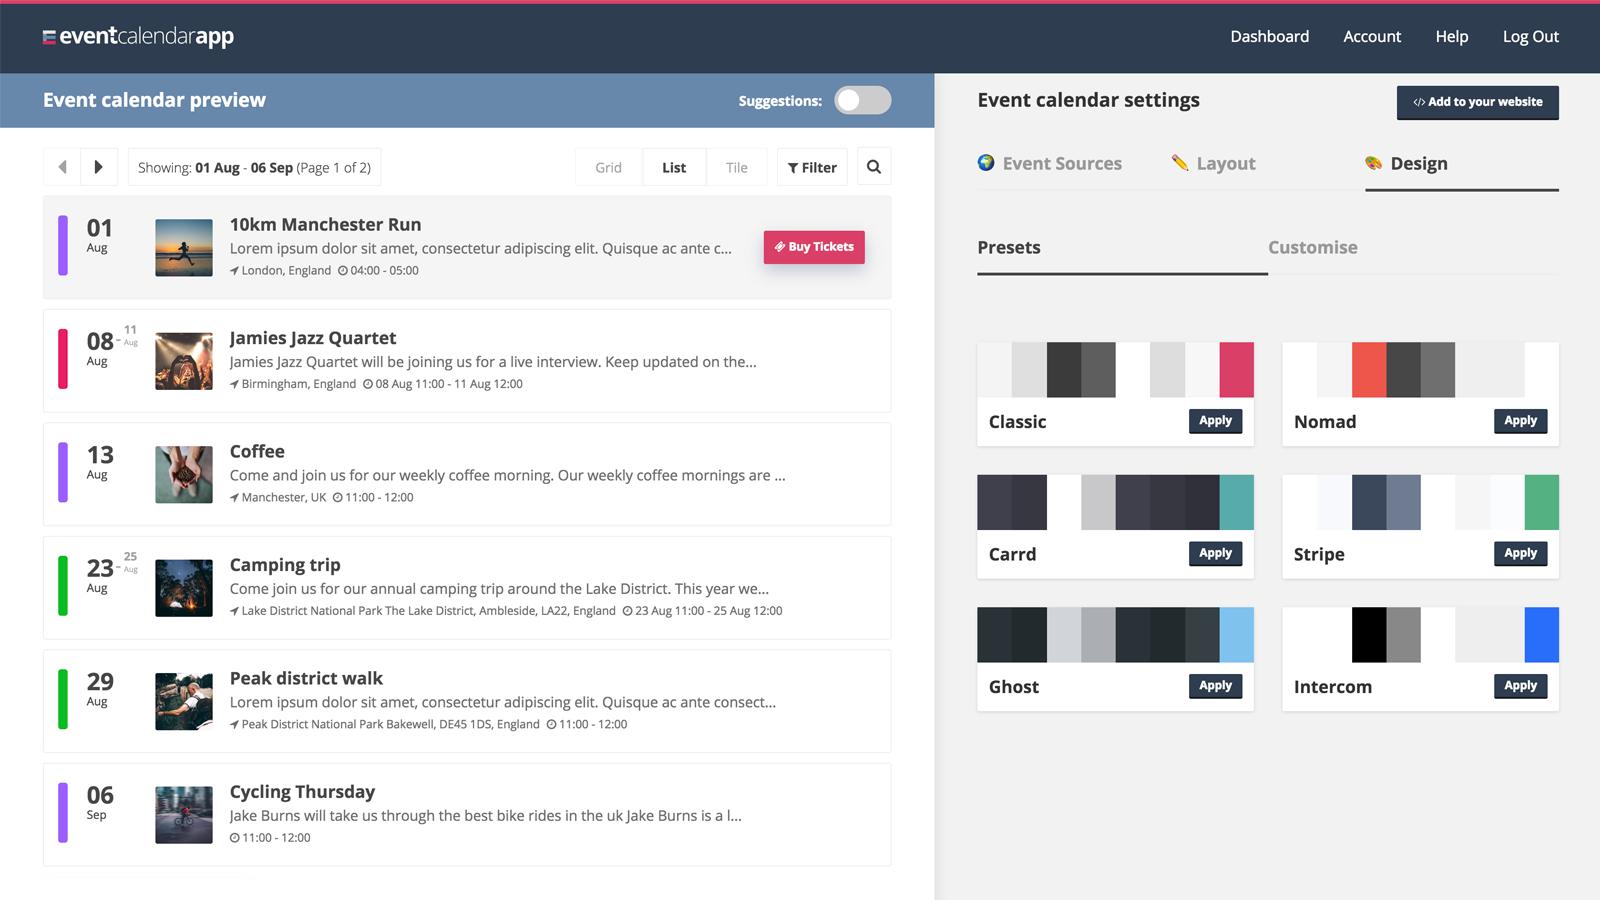 Event Calendar App – Ecommerce Plugins For Online Stores With Put Google Calendar On Desktop